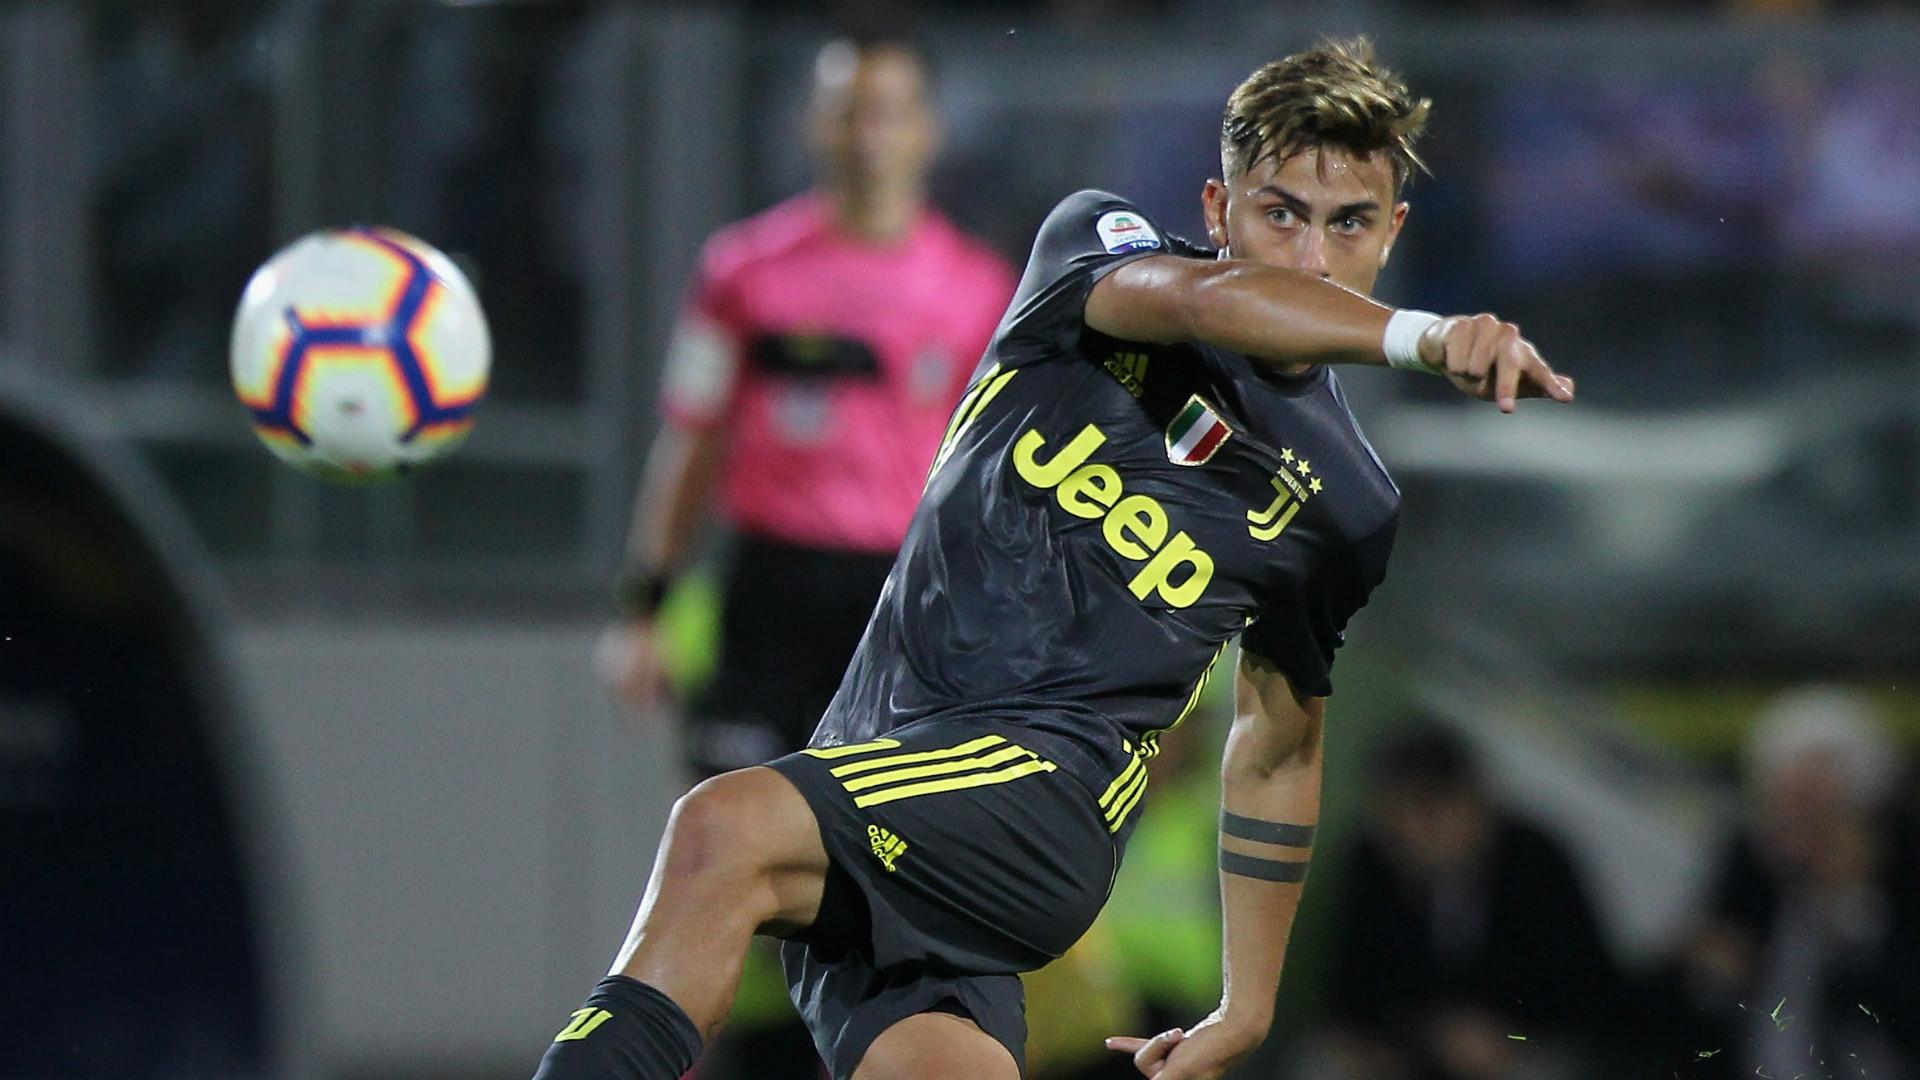 Dybala Frosinone Juventus